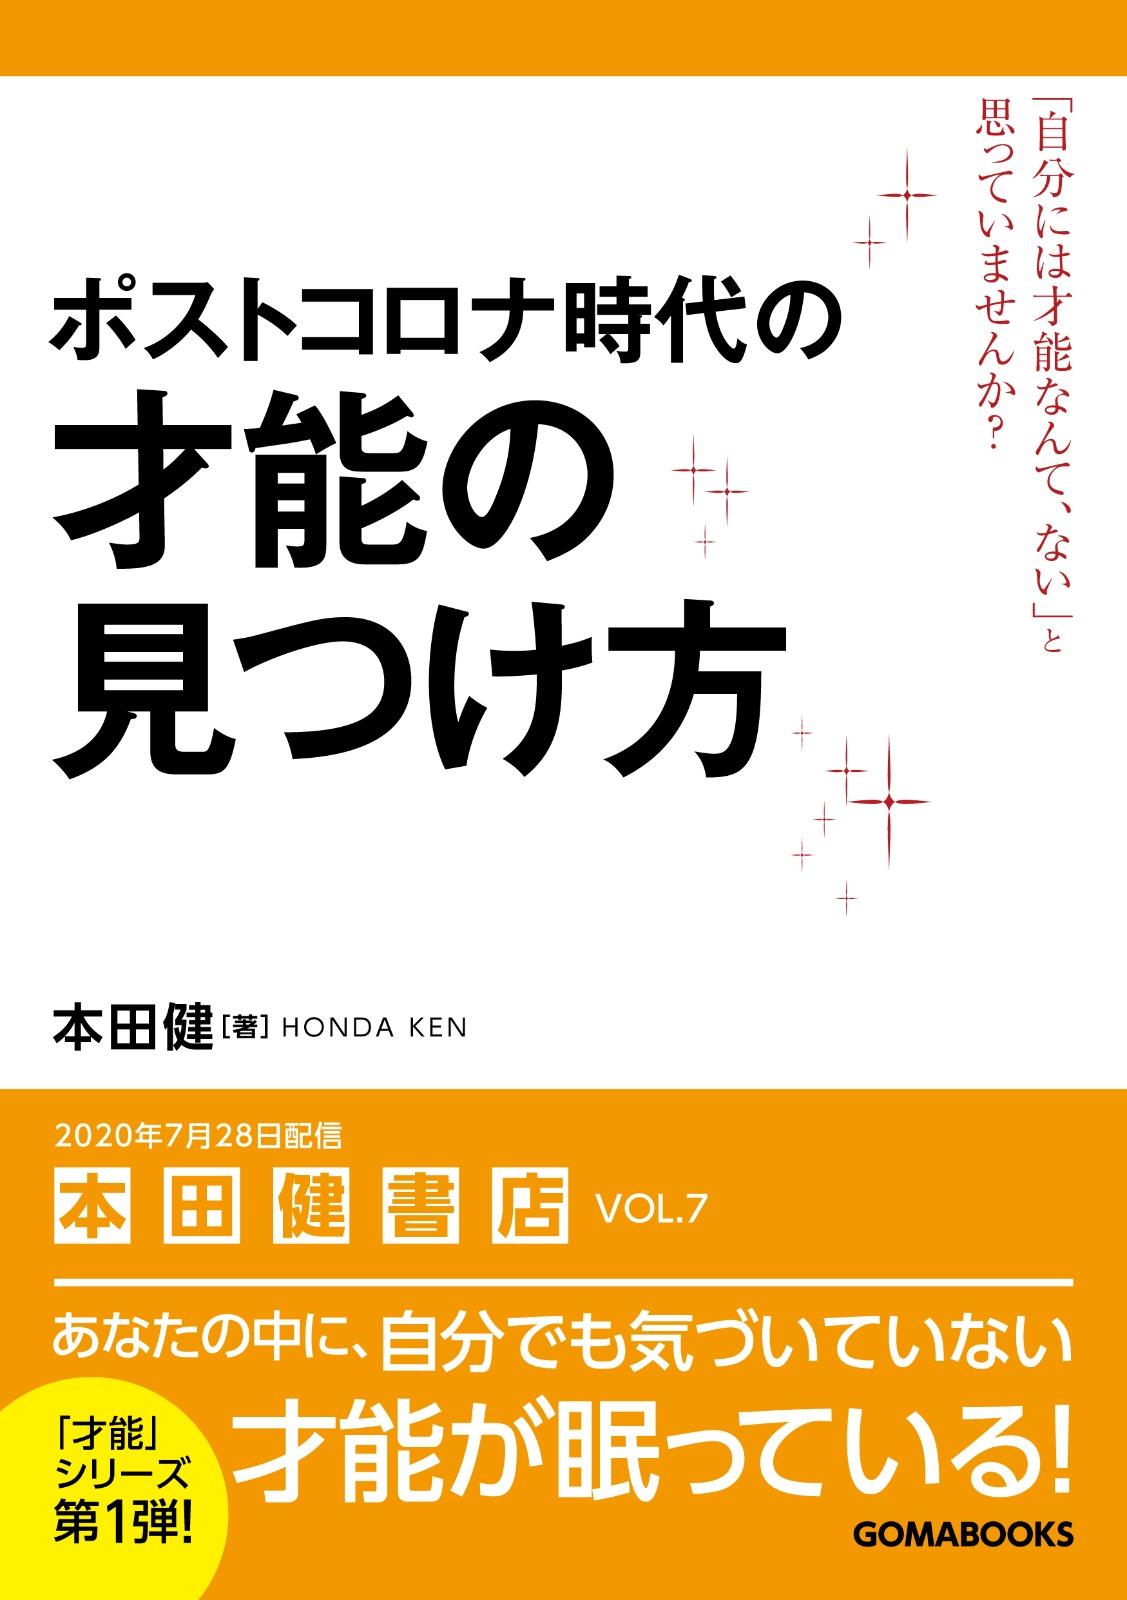 hondaken_vol6